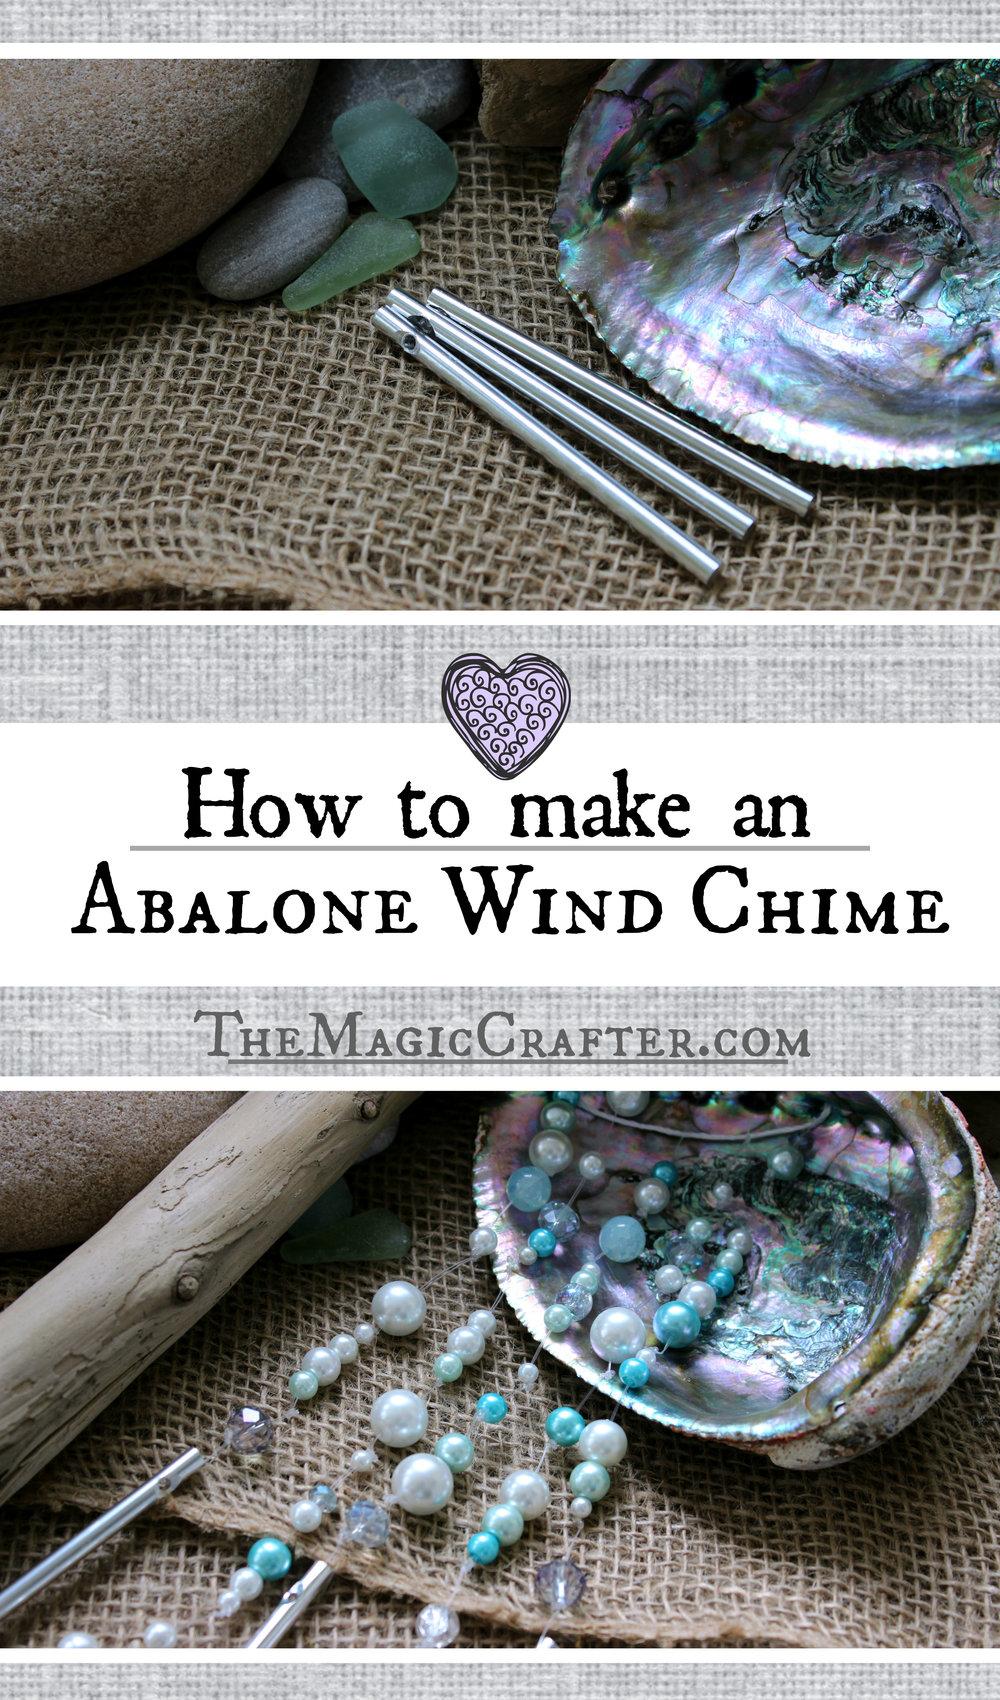 aea0afac65ad9 How to Make an Abalone Wind Chime - DIY Mermaid Beach Home Decor ...